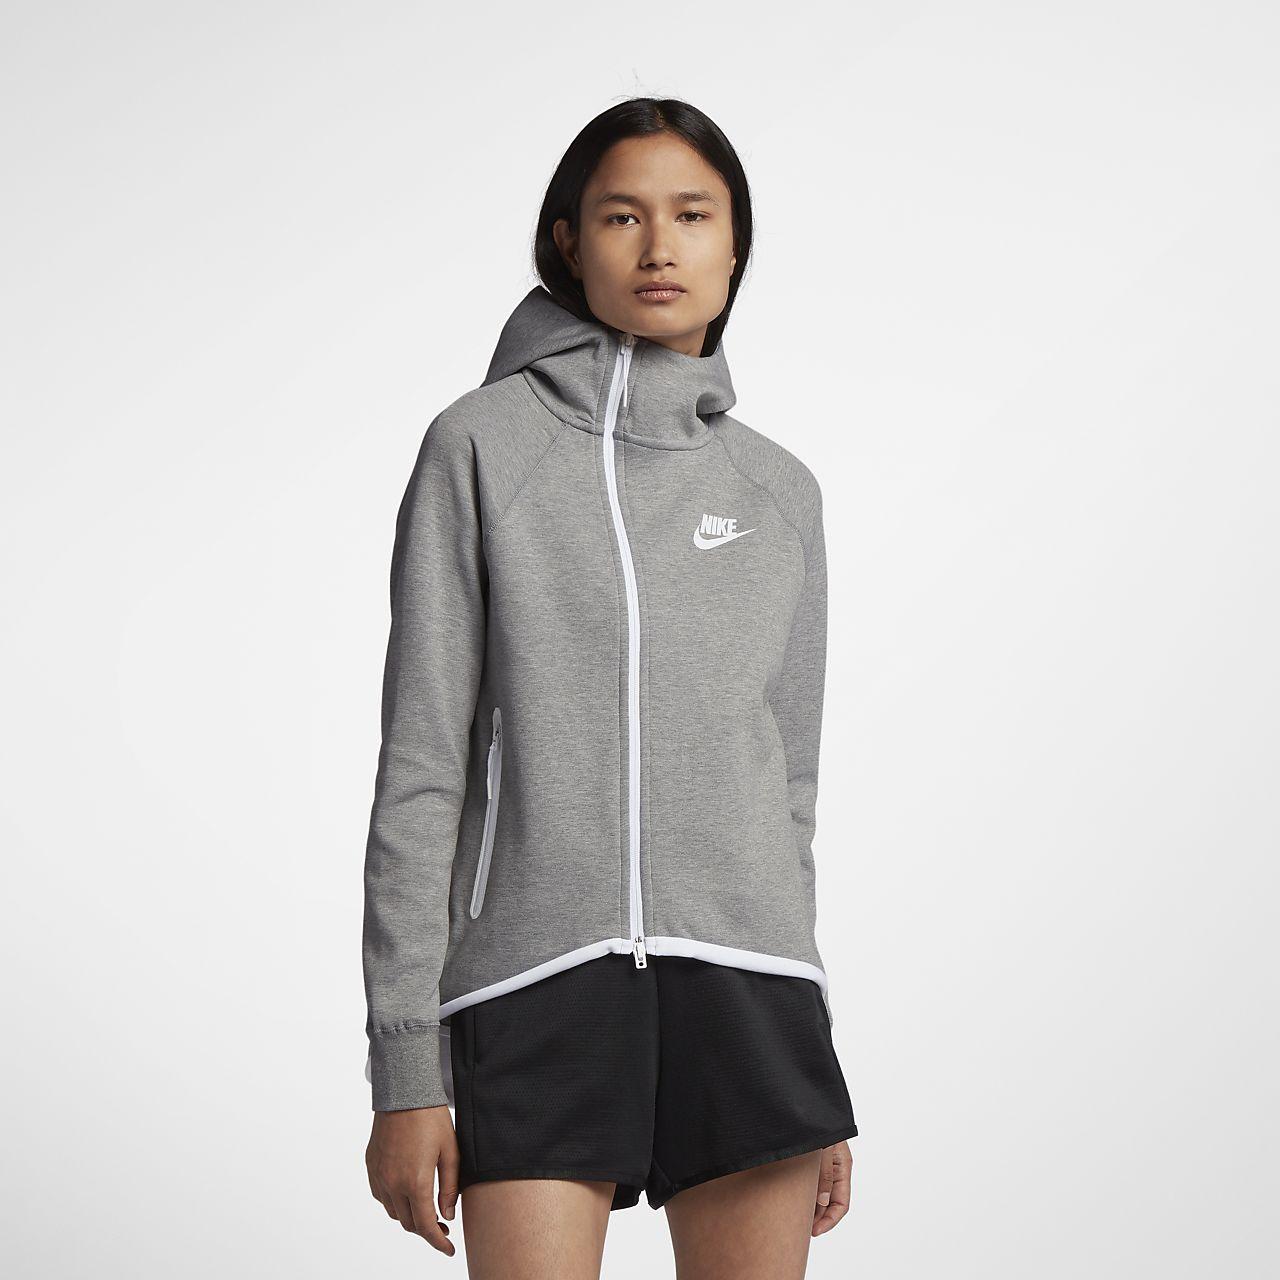 Nike Sportswear Tech Fleece Capa con cremallera completa - Mujer